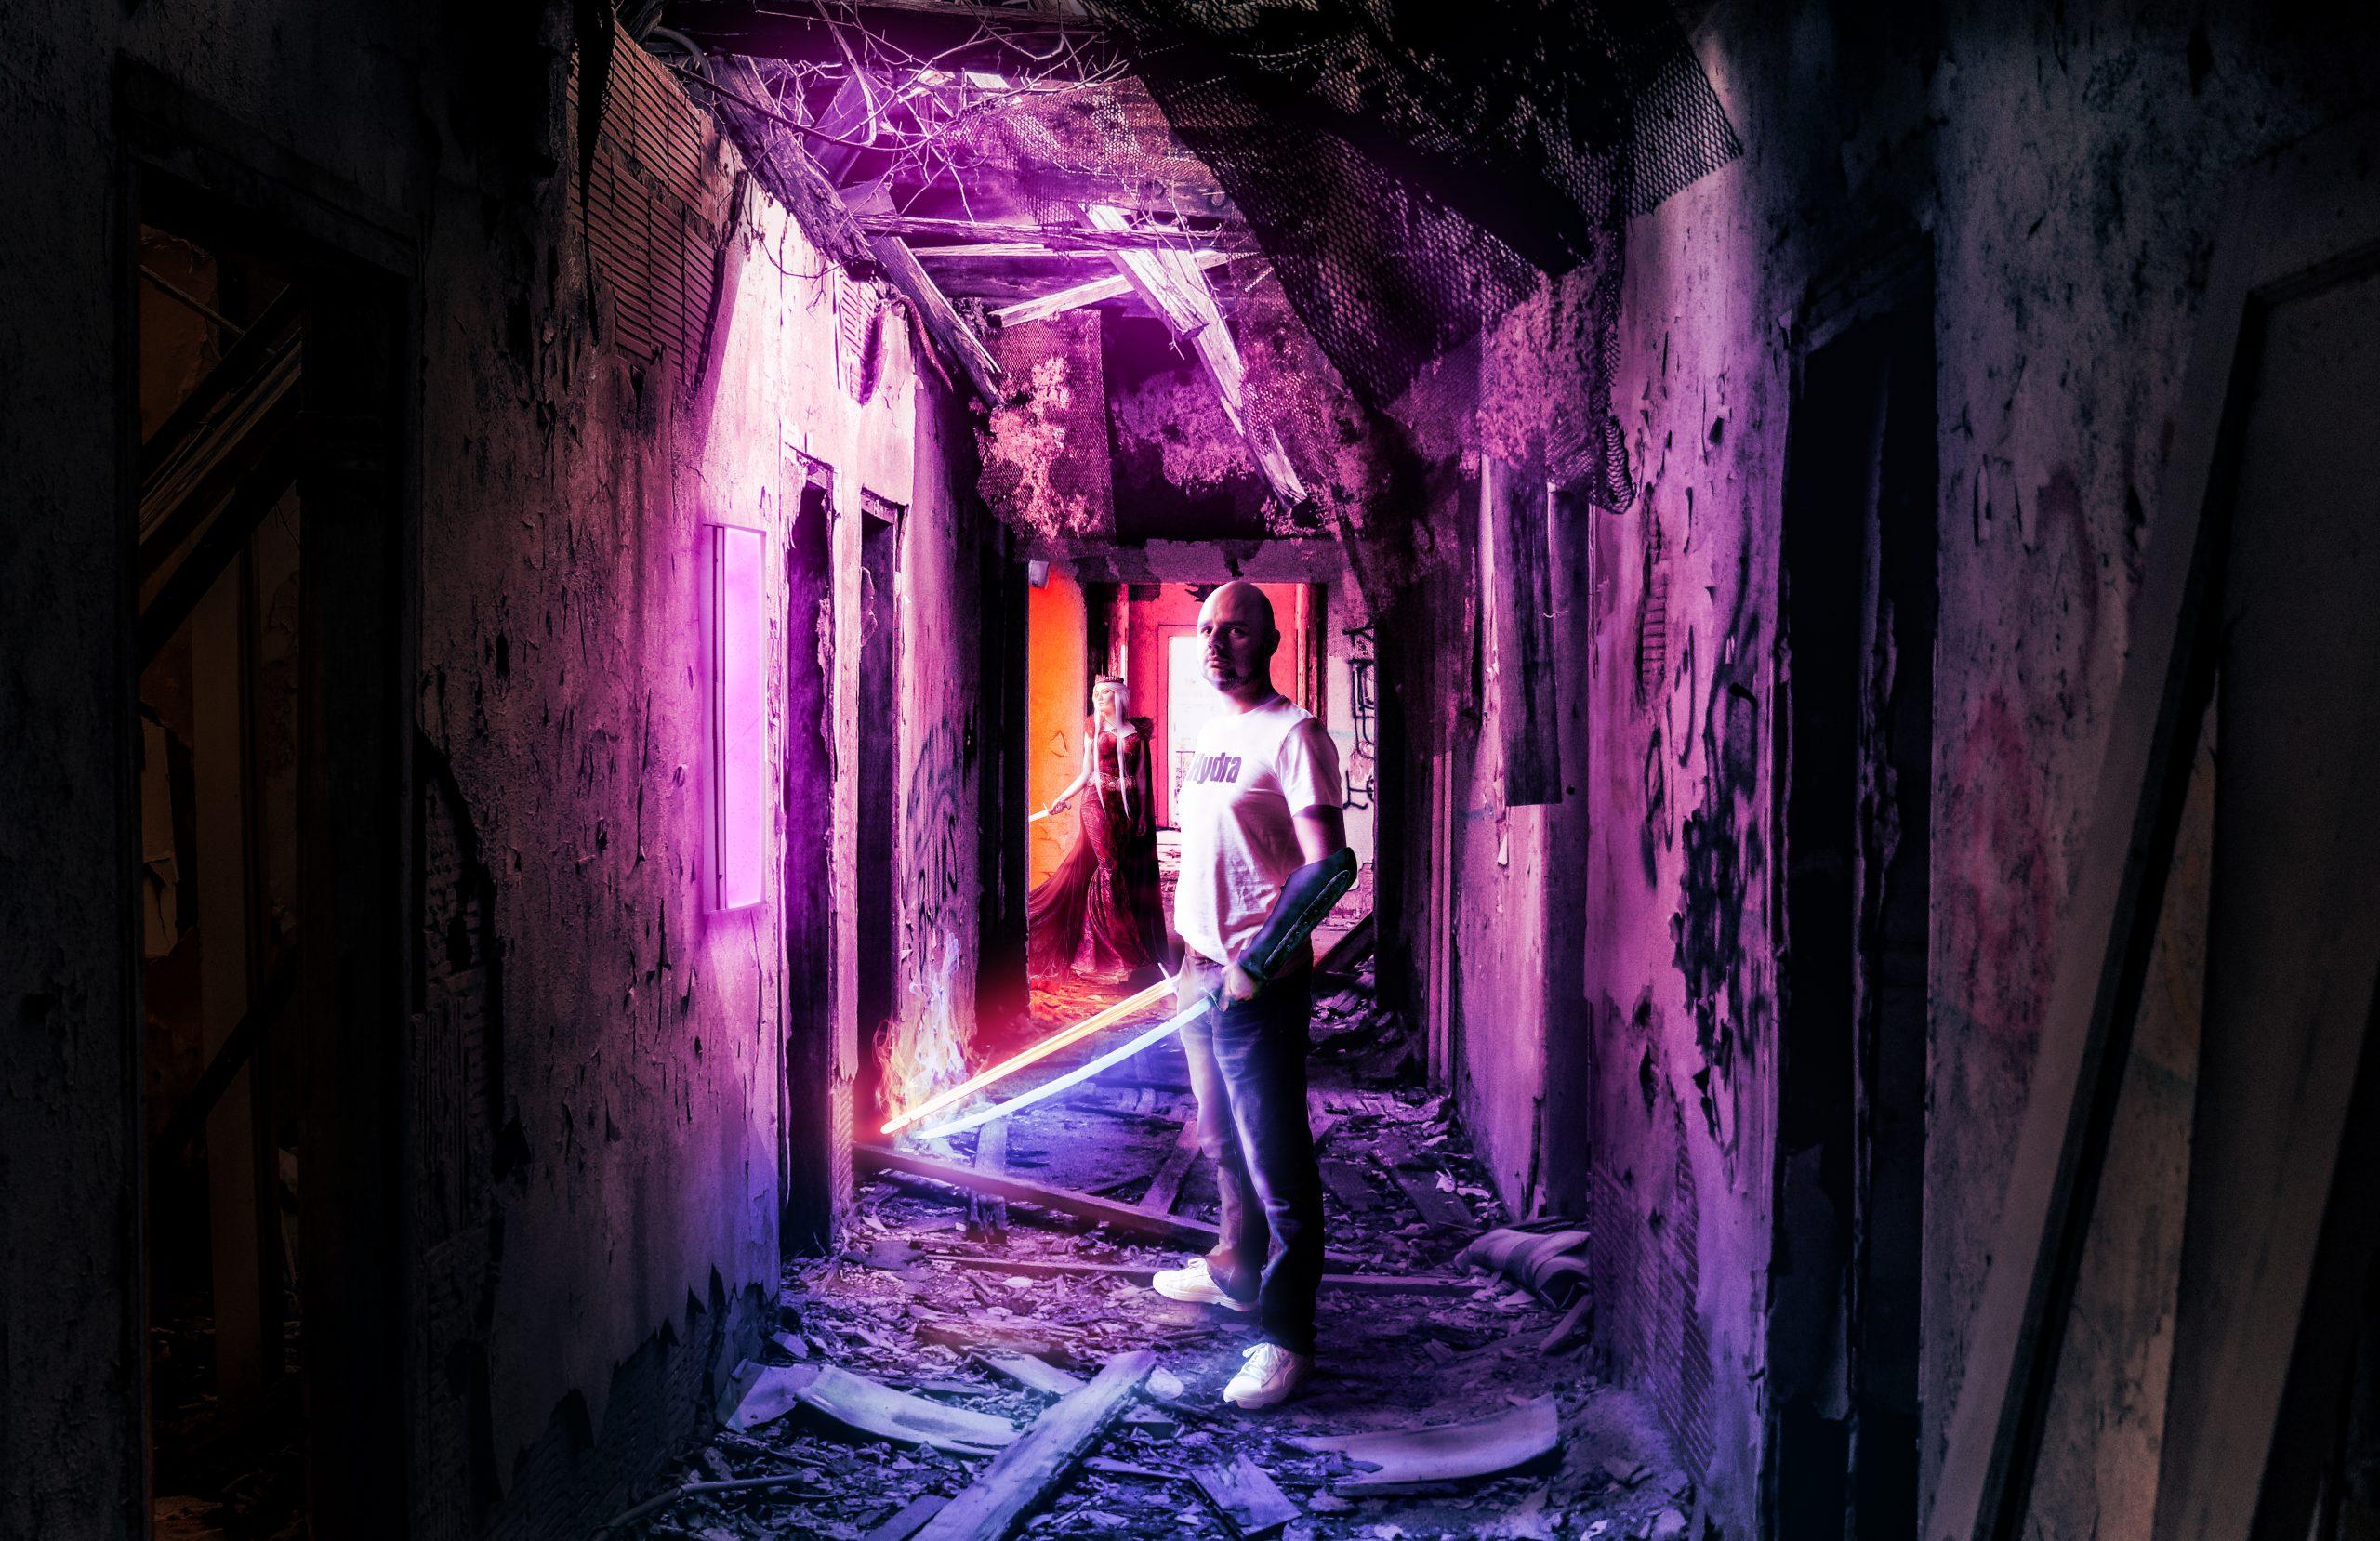 doka79-Photoshop-Artwork-003